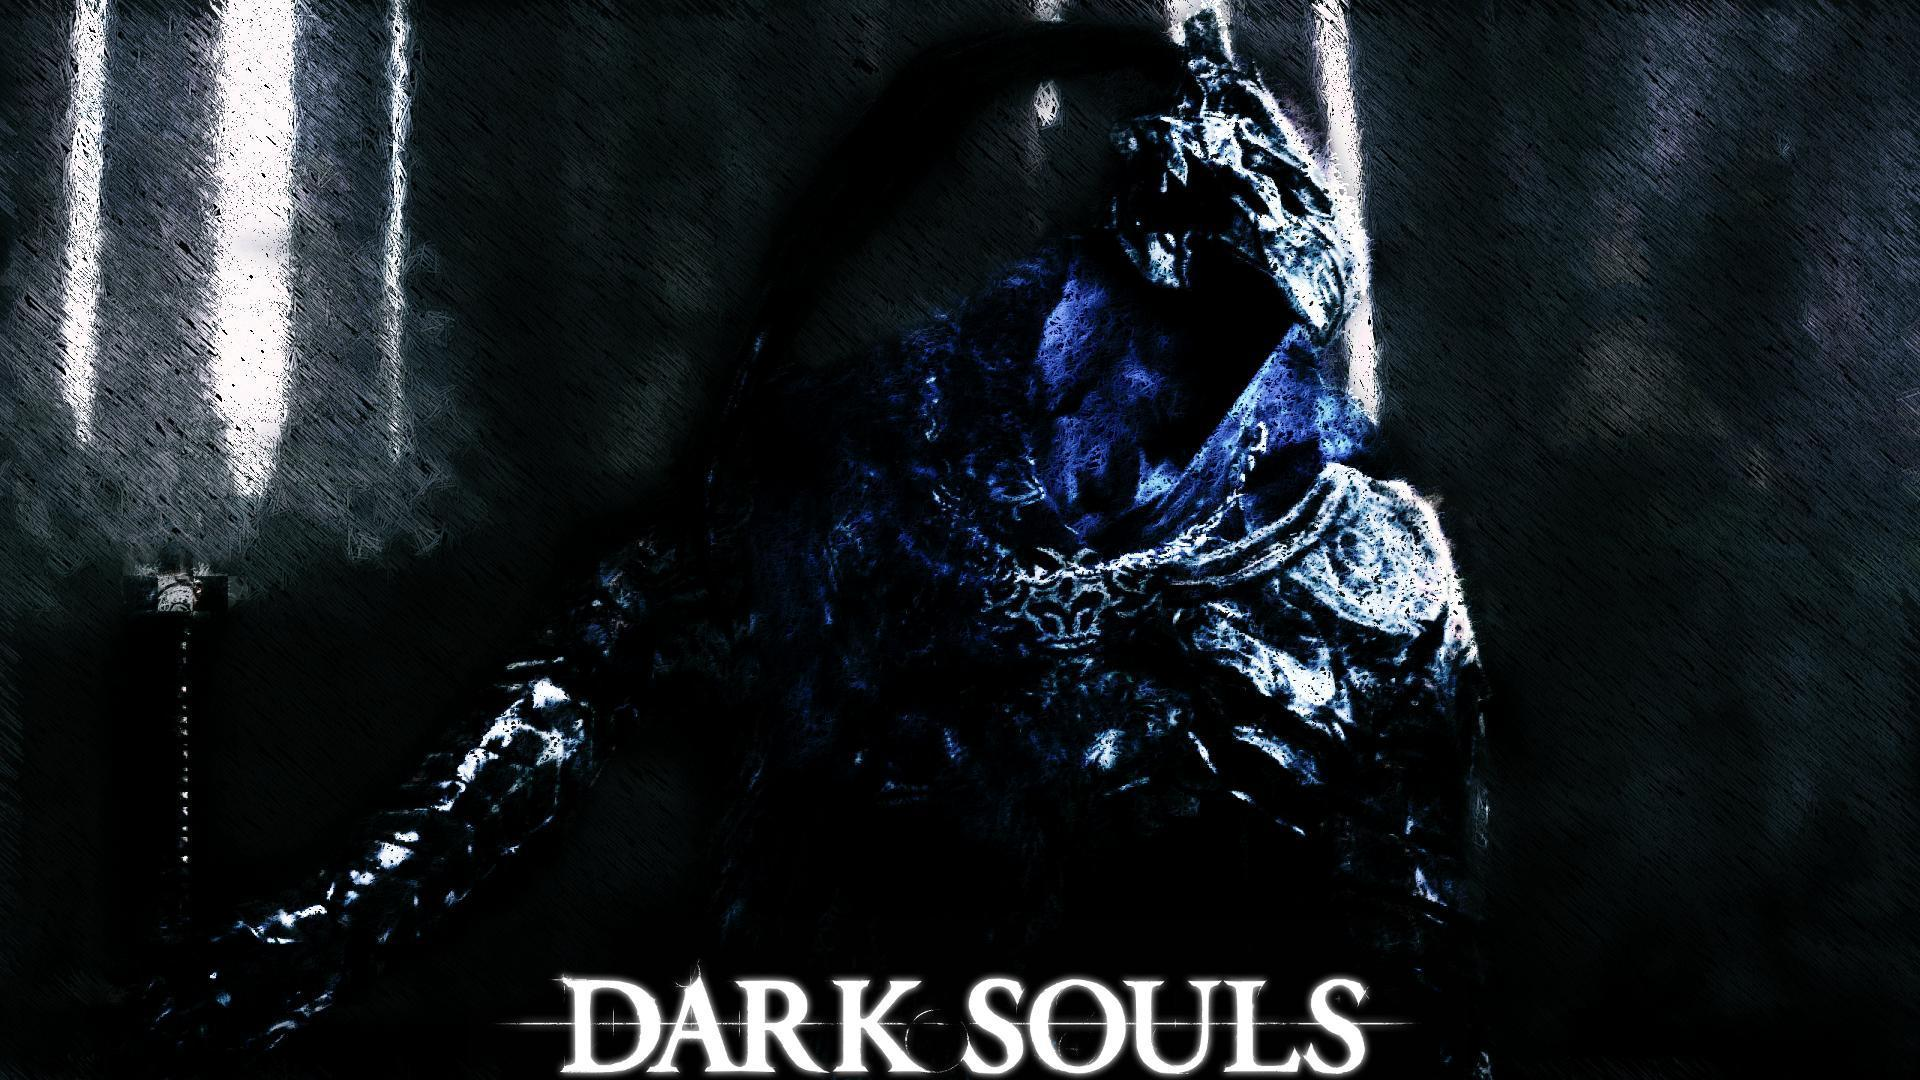 dark souls 3 wallpaper 1080p - photo #40